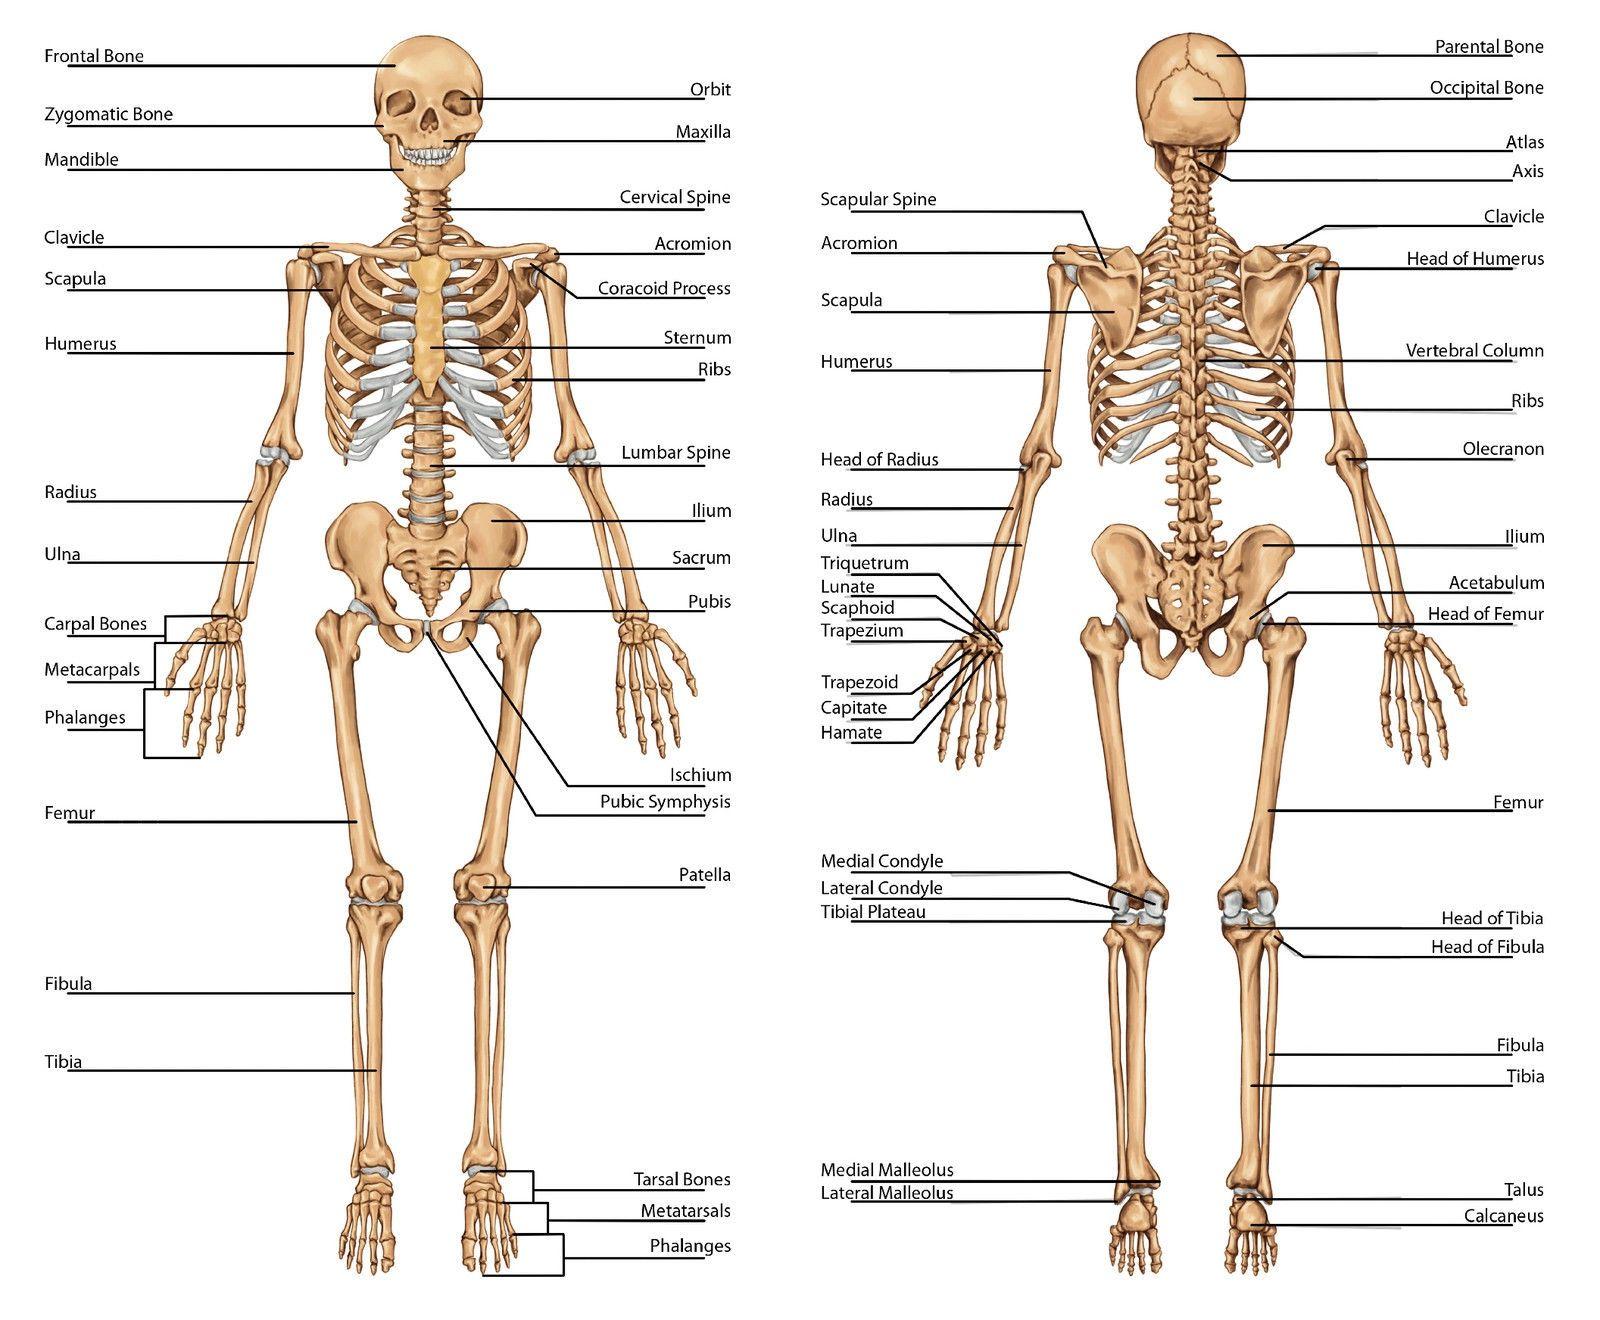 hight resolution of anatomy of the bones in your body skeleton bones human skeleton anatomy bones diagram human anatomy